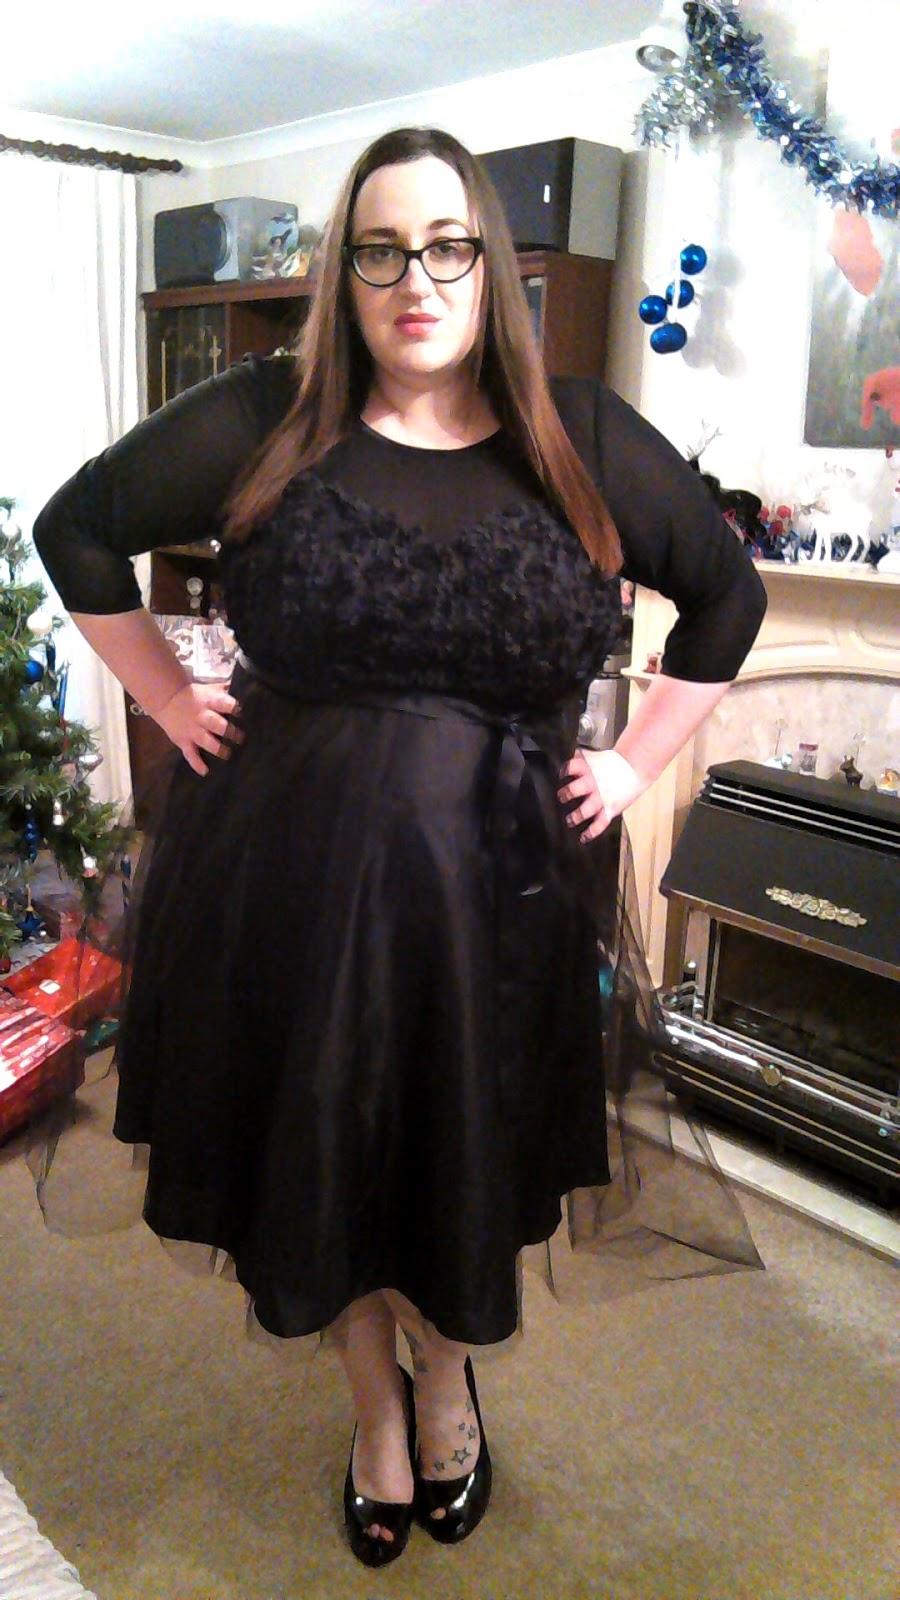 Fat girls in single short dress idea brilliant